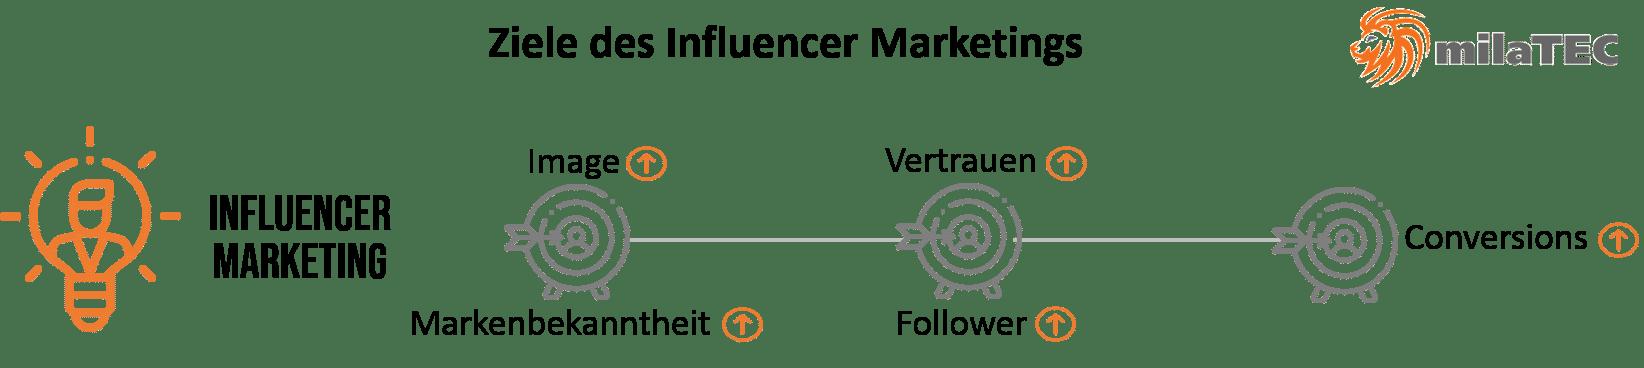 Ziele des Influencer Marketings